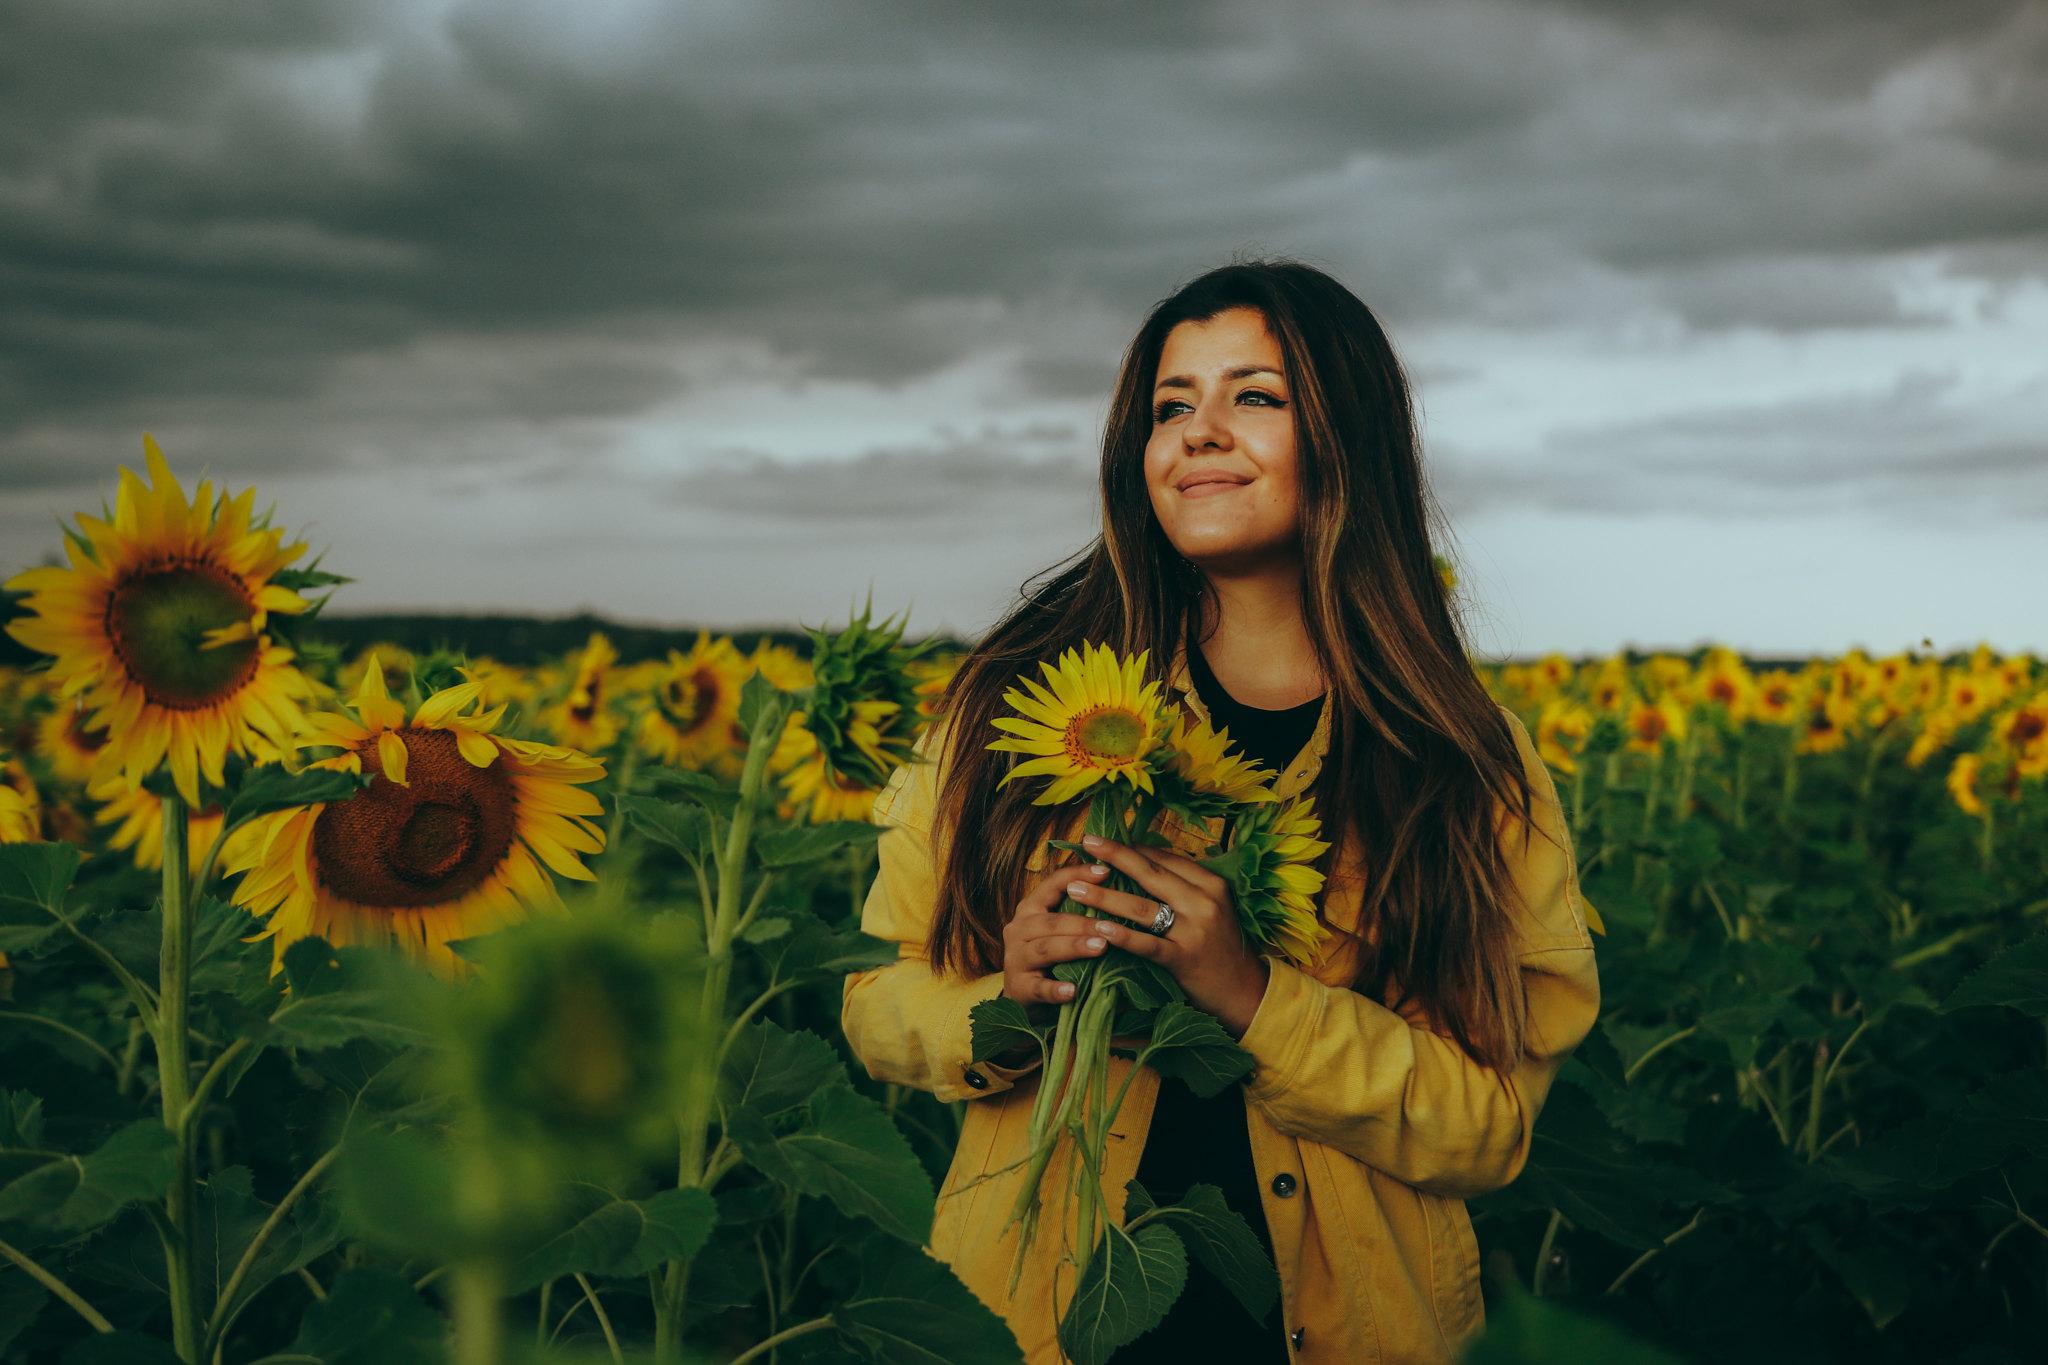 auringonkukkia-5